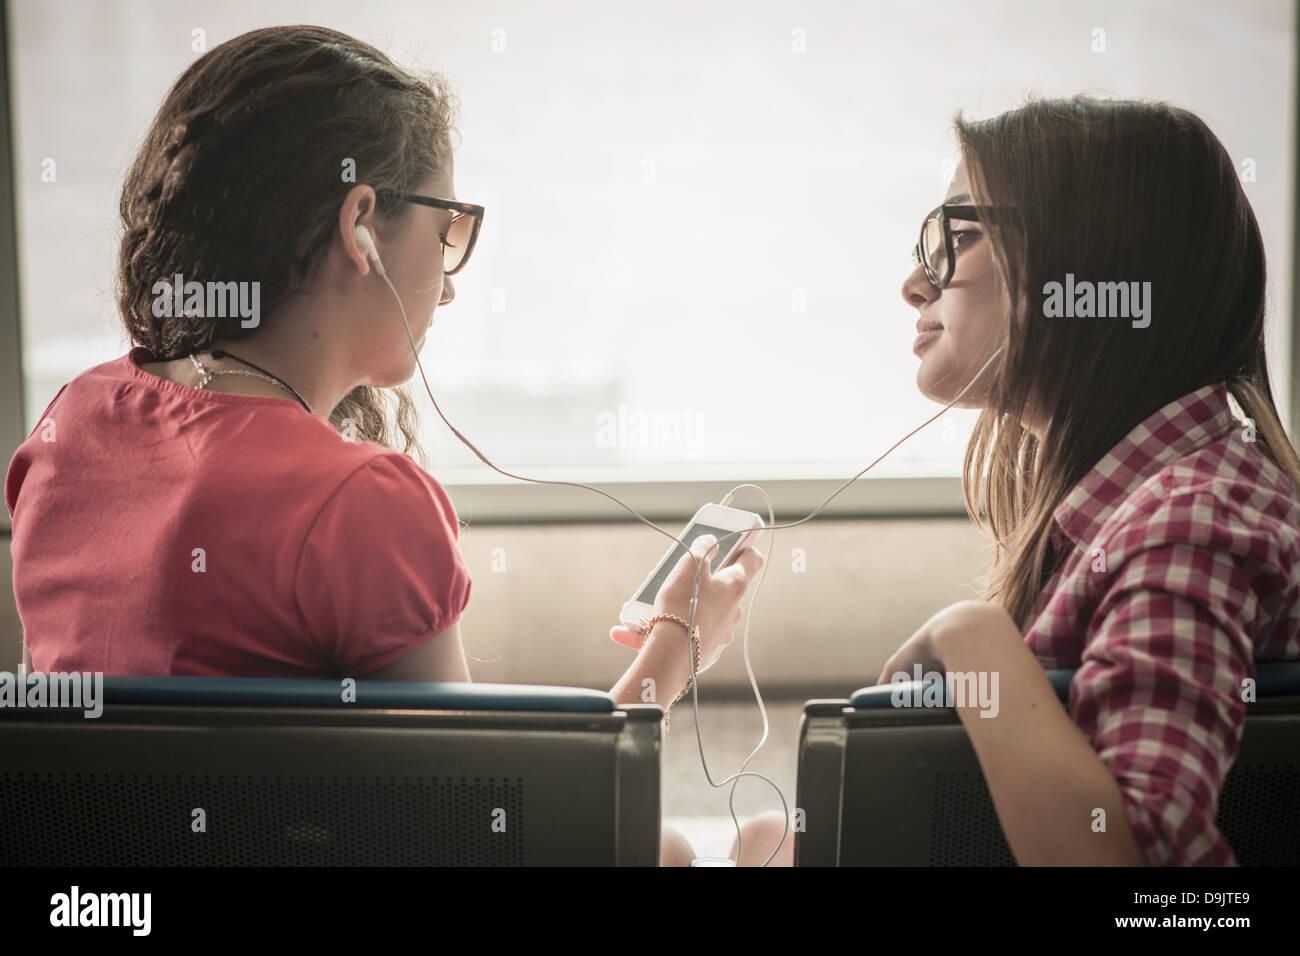 Dos chicas adolescentes con gafas de sol escuchando música Imagen De Stock